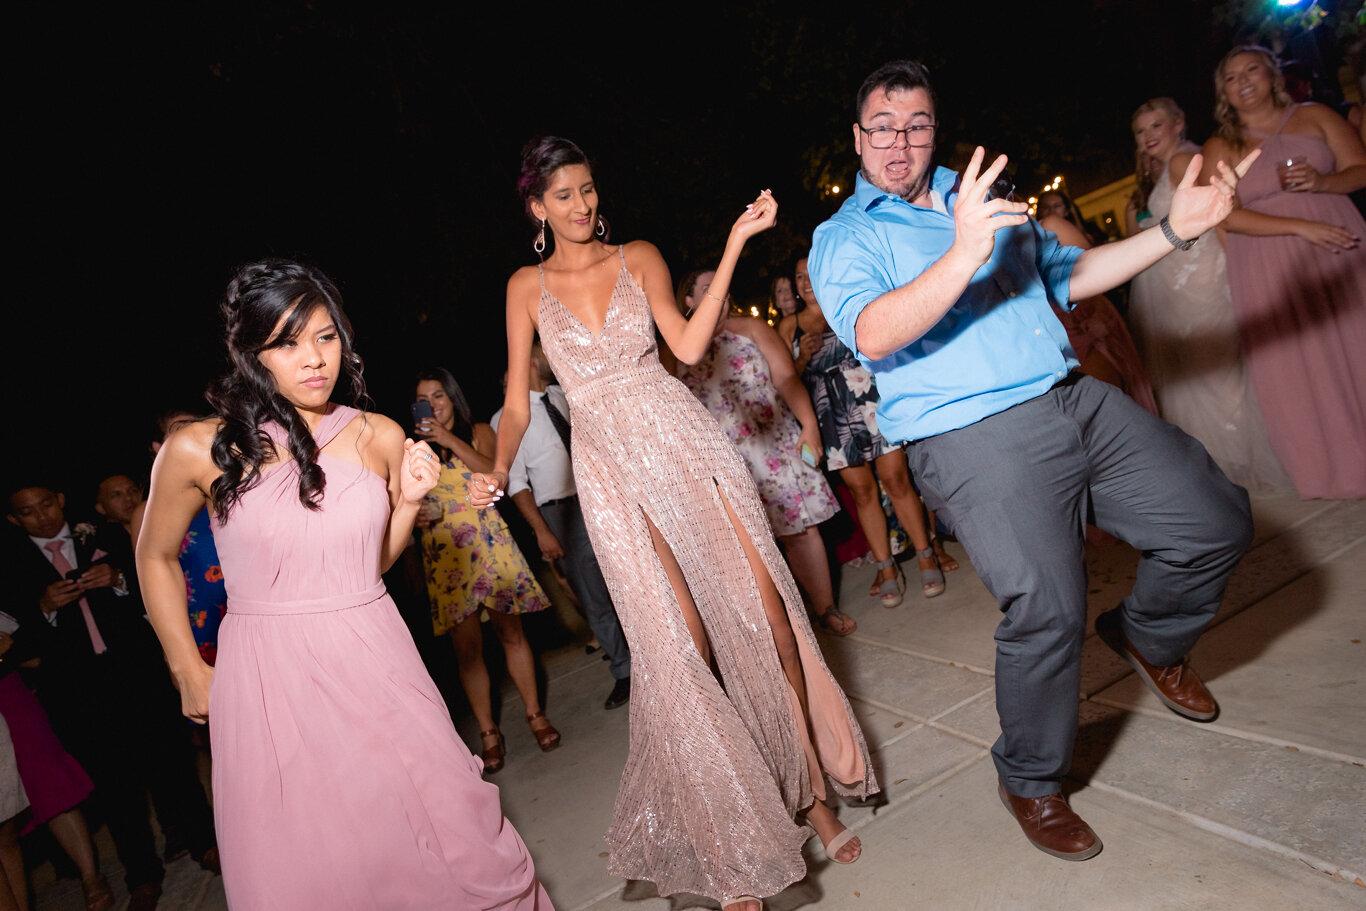 2019.08.24_Emily-Ashir-Wedding-at-the-Maples-6495.jpg